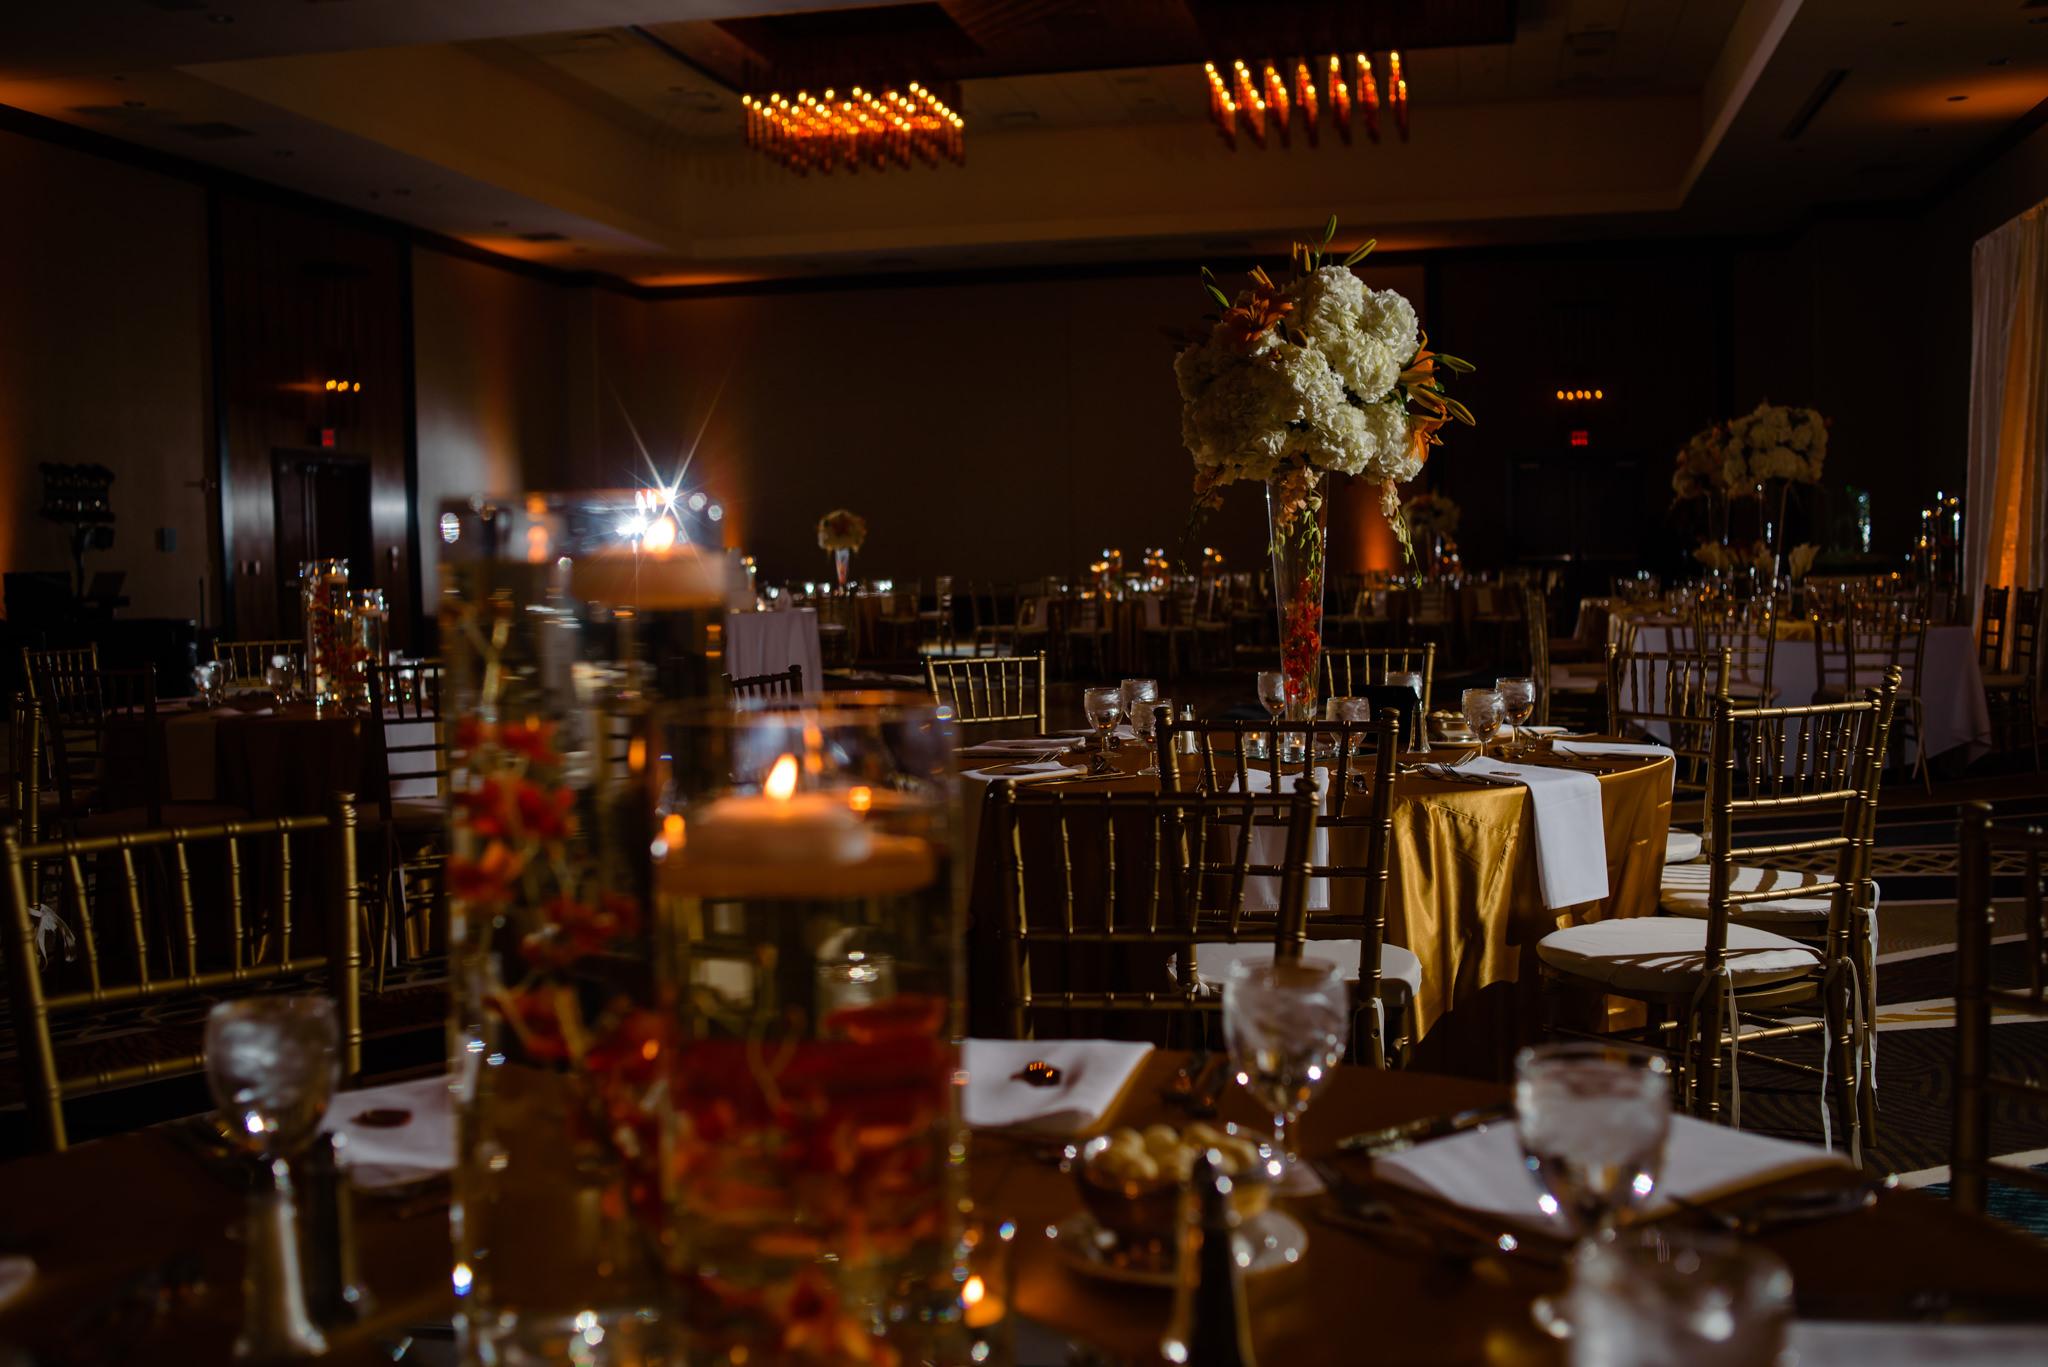 HILTON-OMAHA-WEDDING-PHOTOGRAPHER-JM-STUDIOS-OMAHA-LIV-BRICE-034.jpg